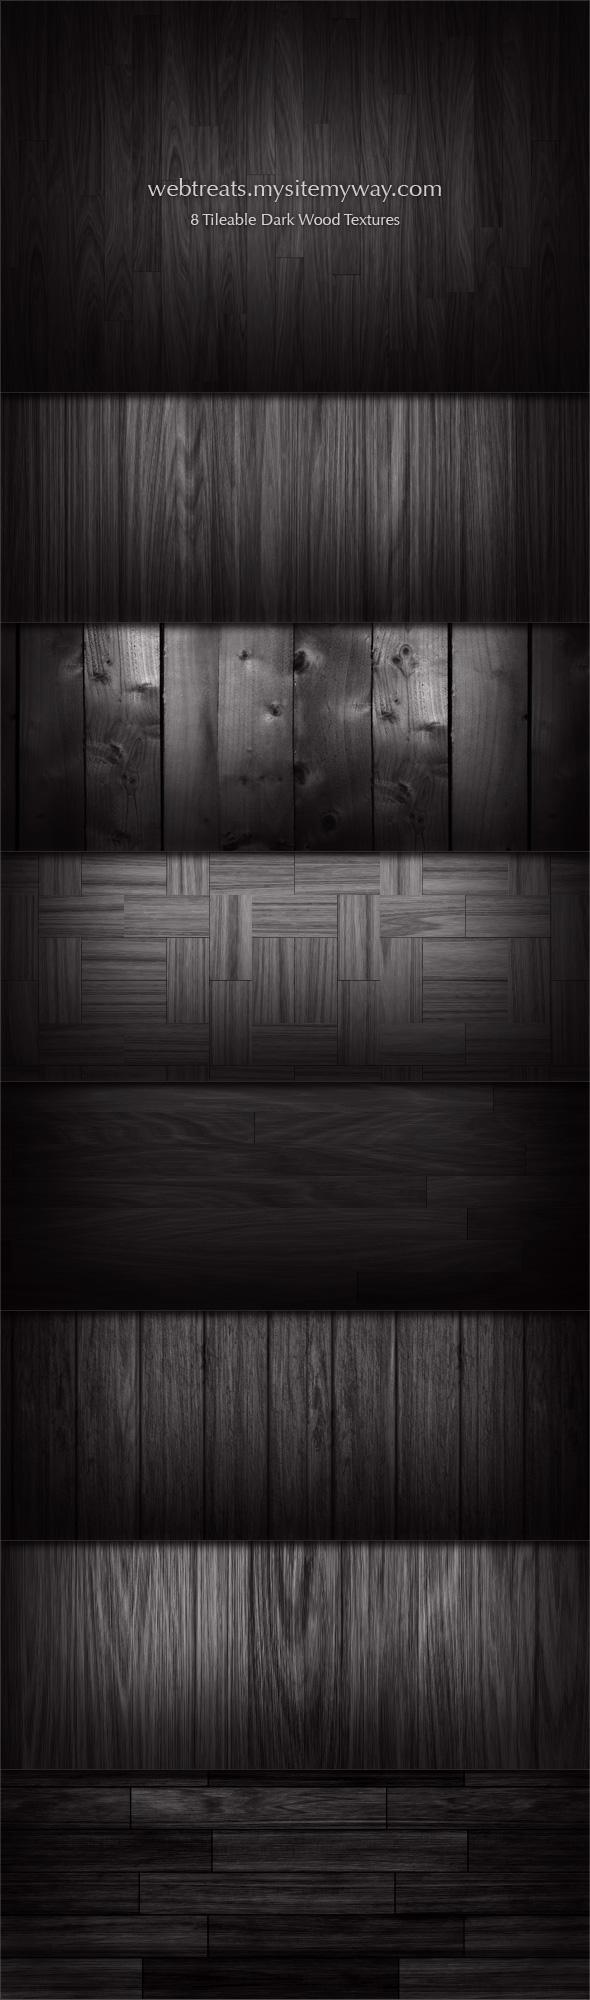 8 Tileable Dark Wood Textures by WebTreatsETC